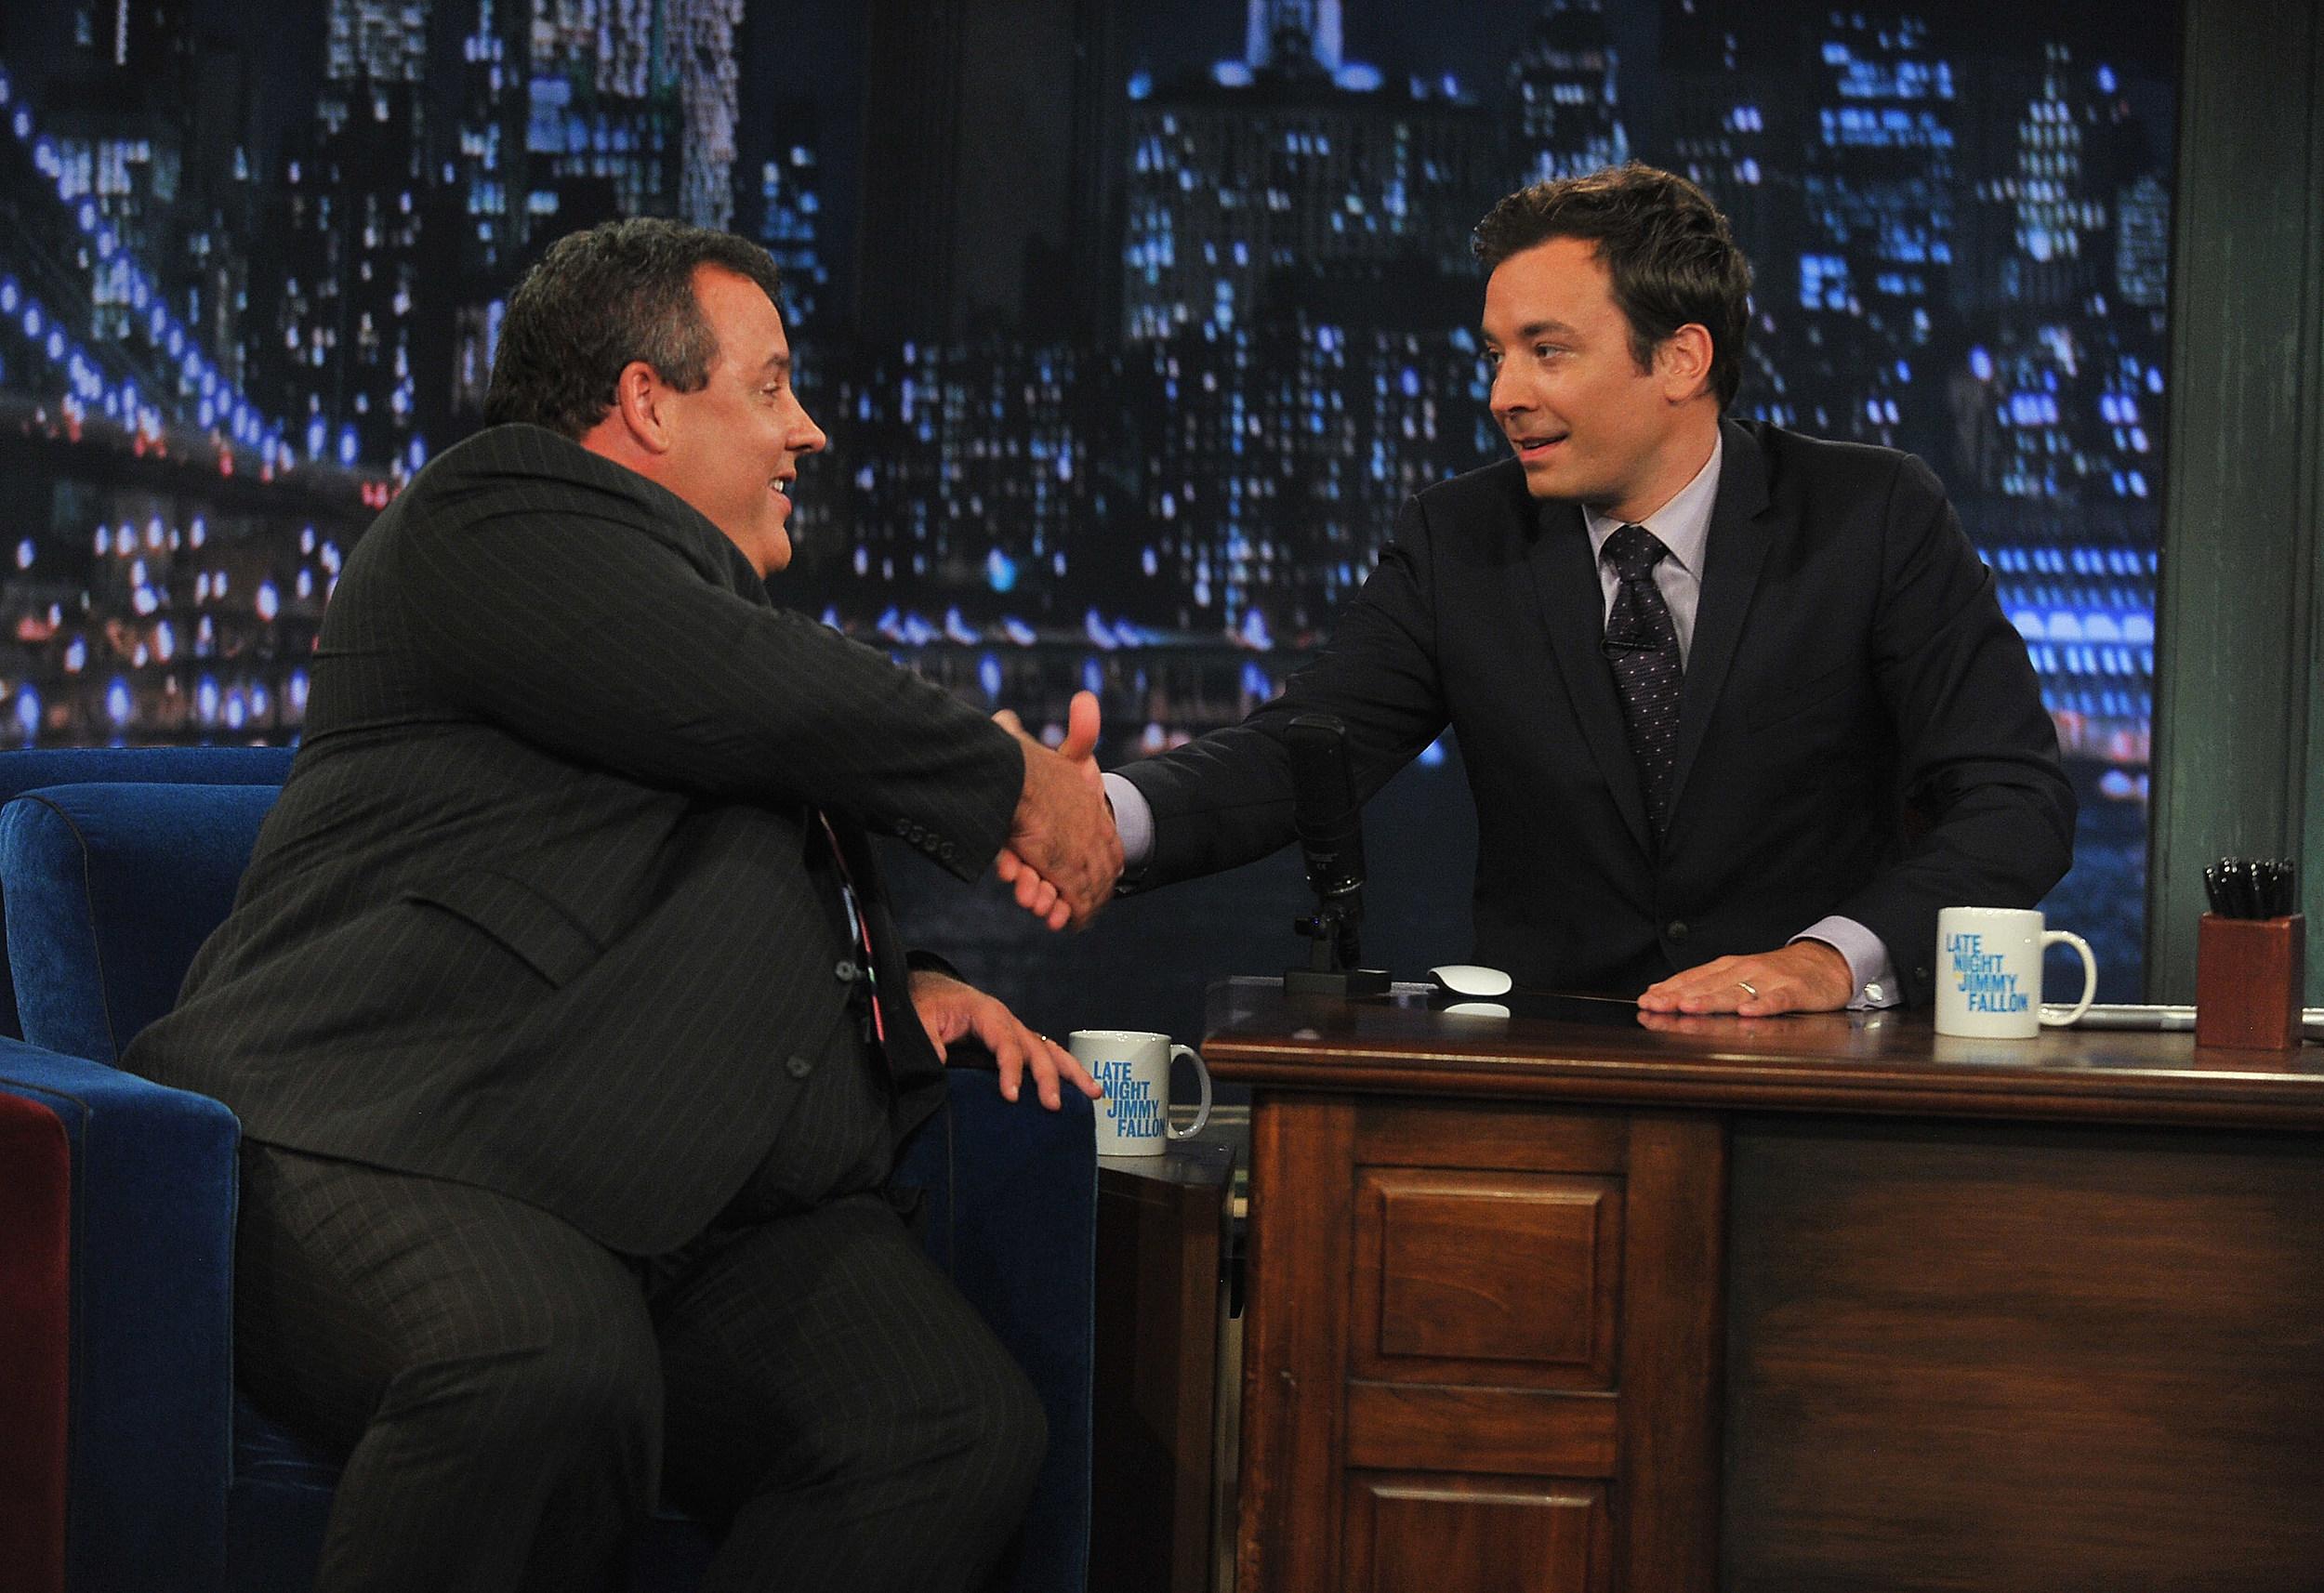 Watch Chris Christie Explain His Awkward 'Hostage' Face on Jimmy Fallon